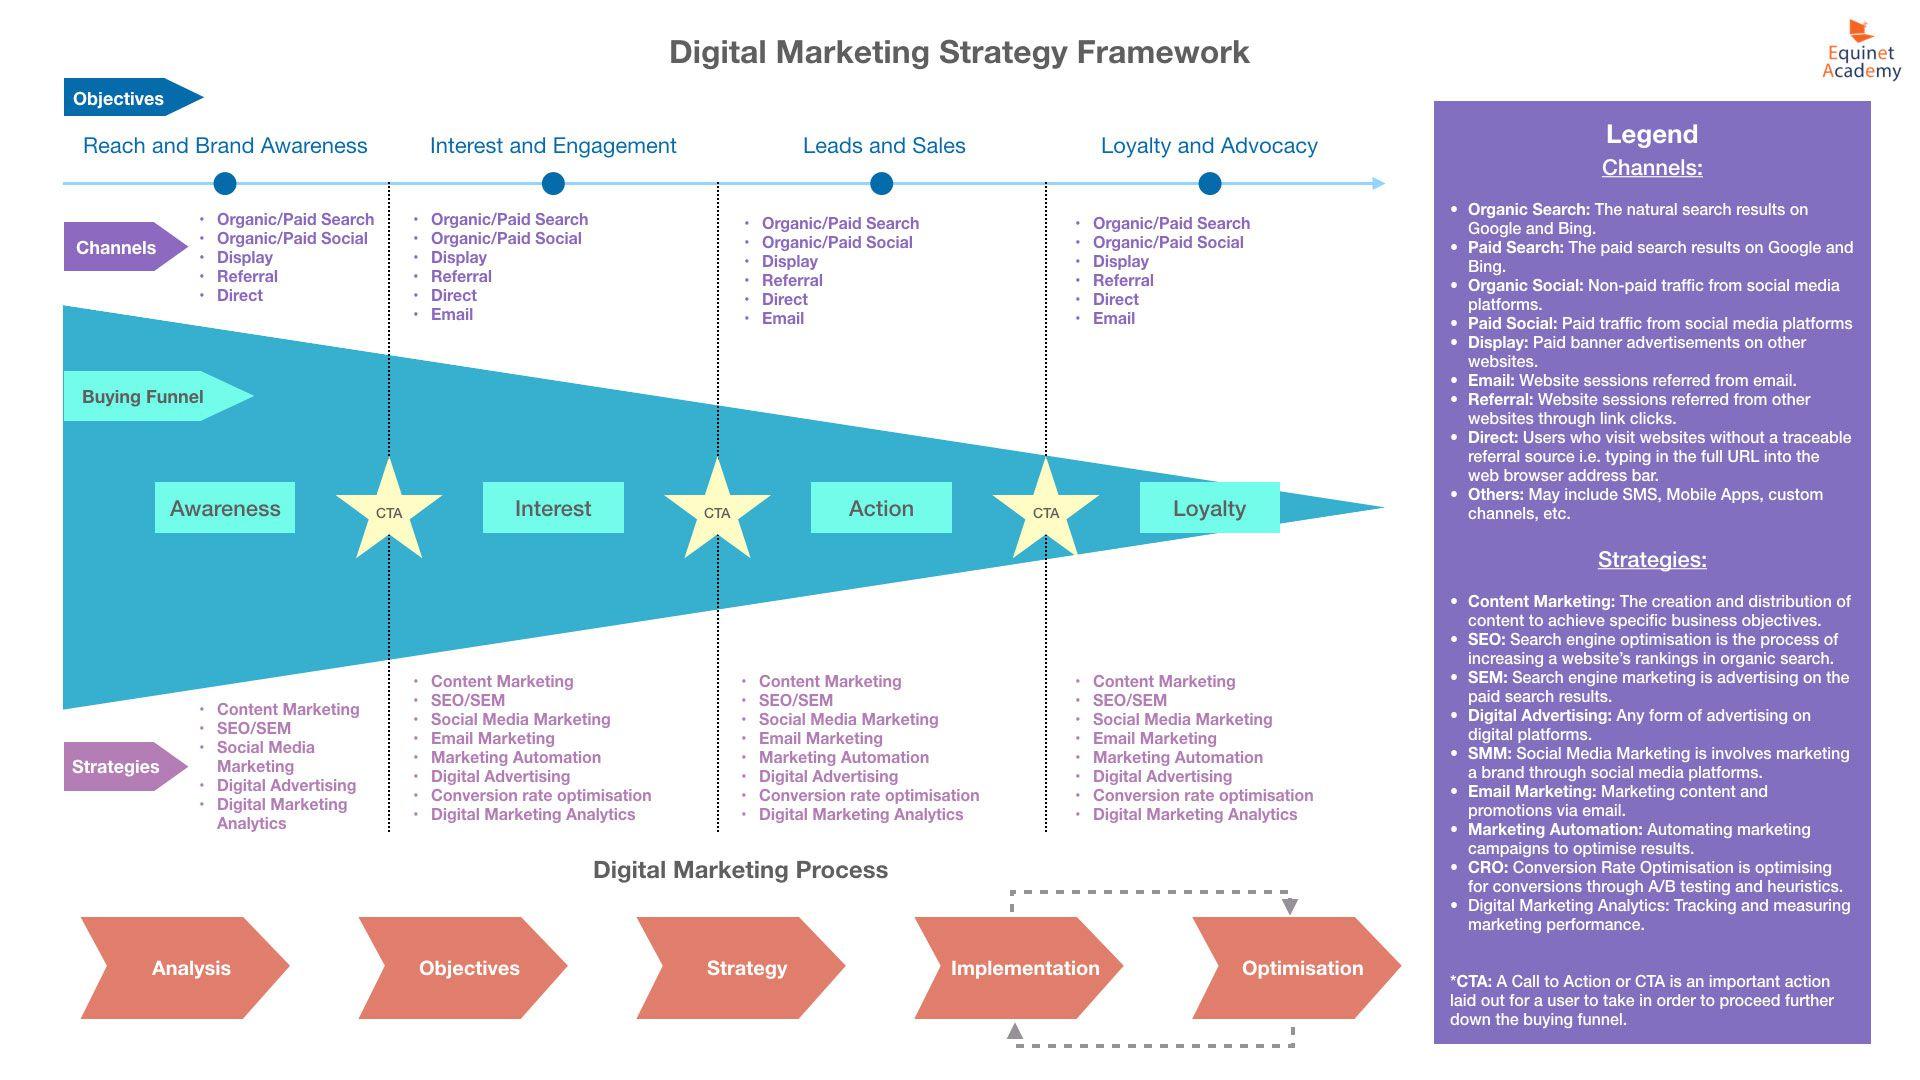 006 Stunning Digital Marketing Campaign Plan Example High Resolution  TemplateFull